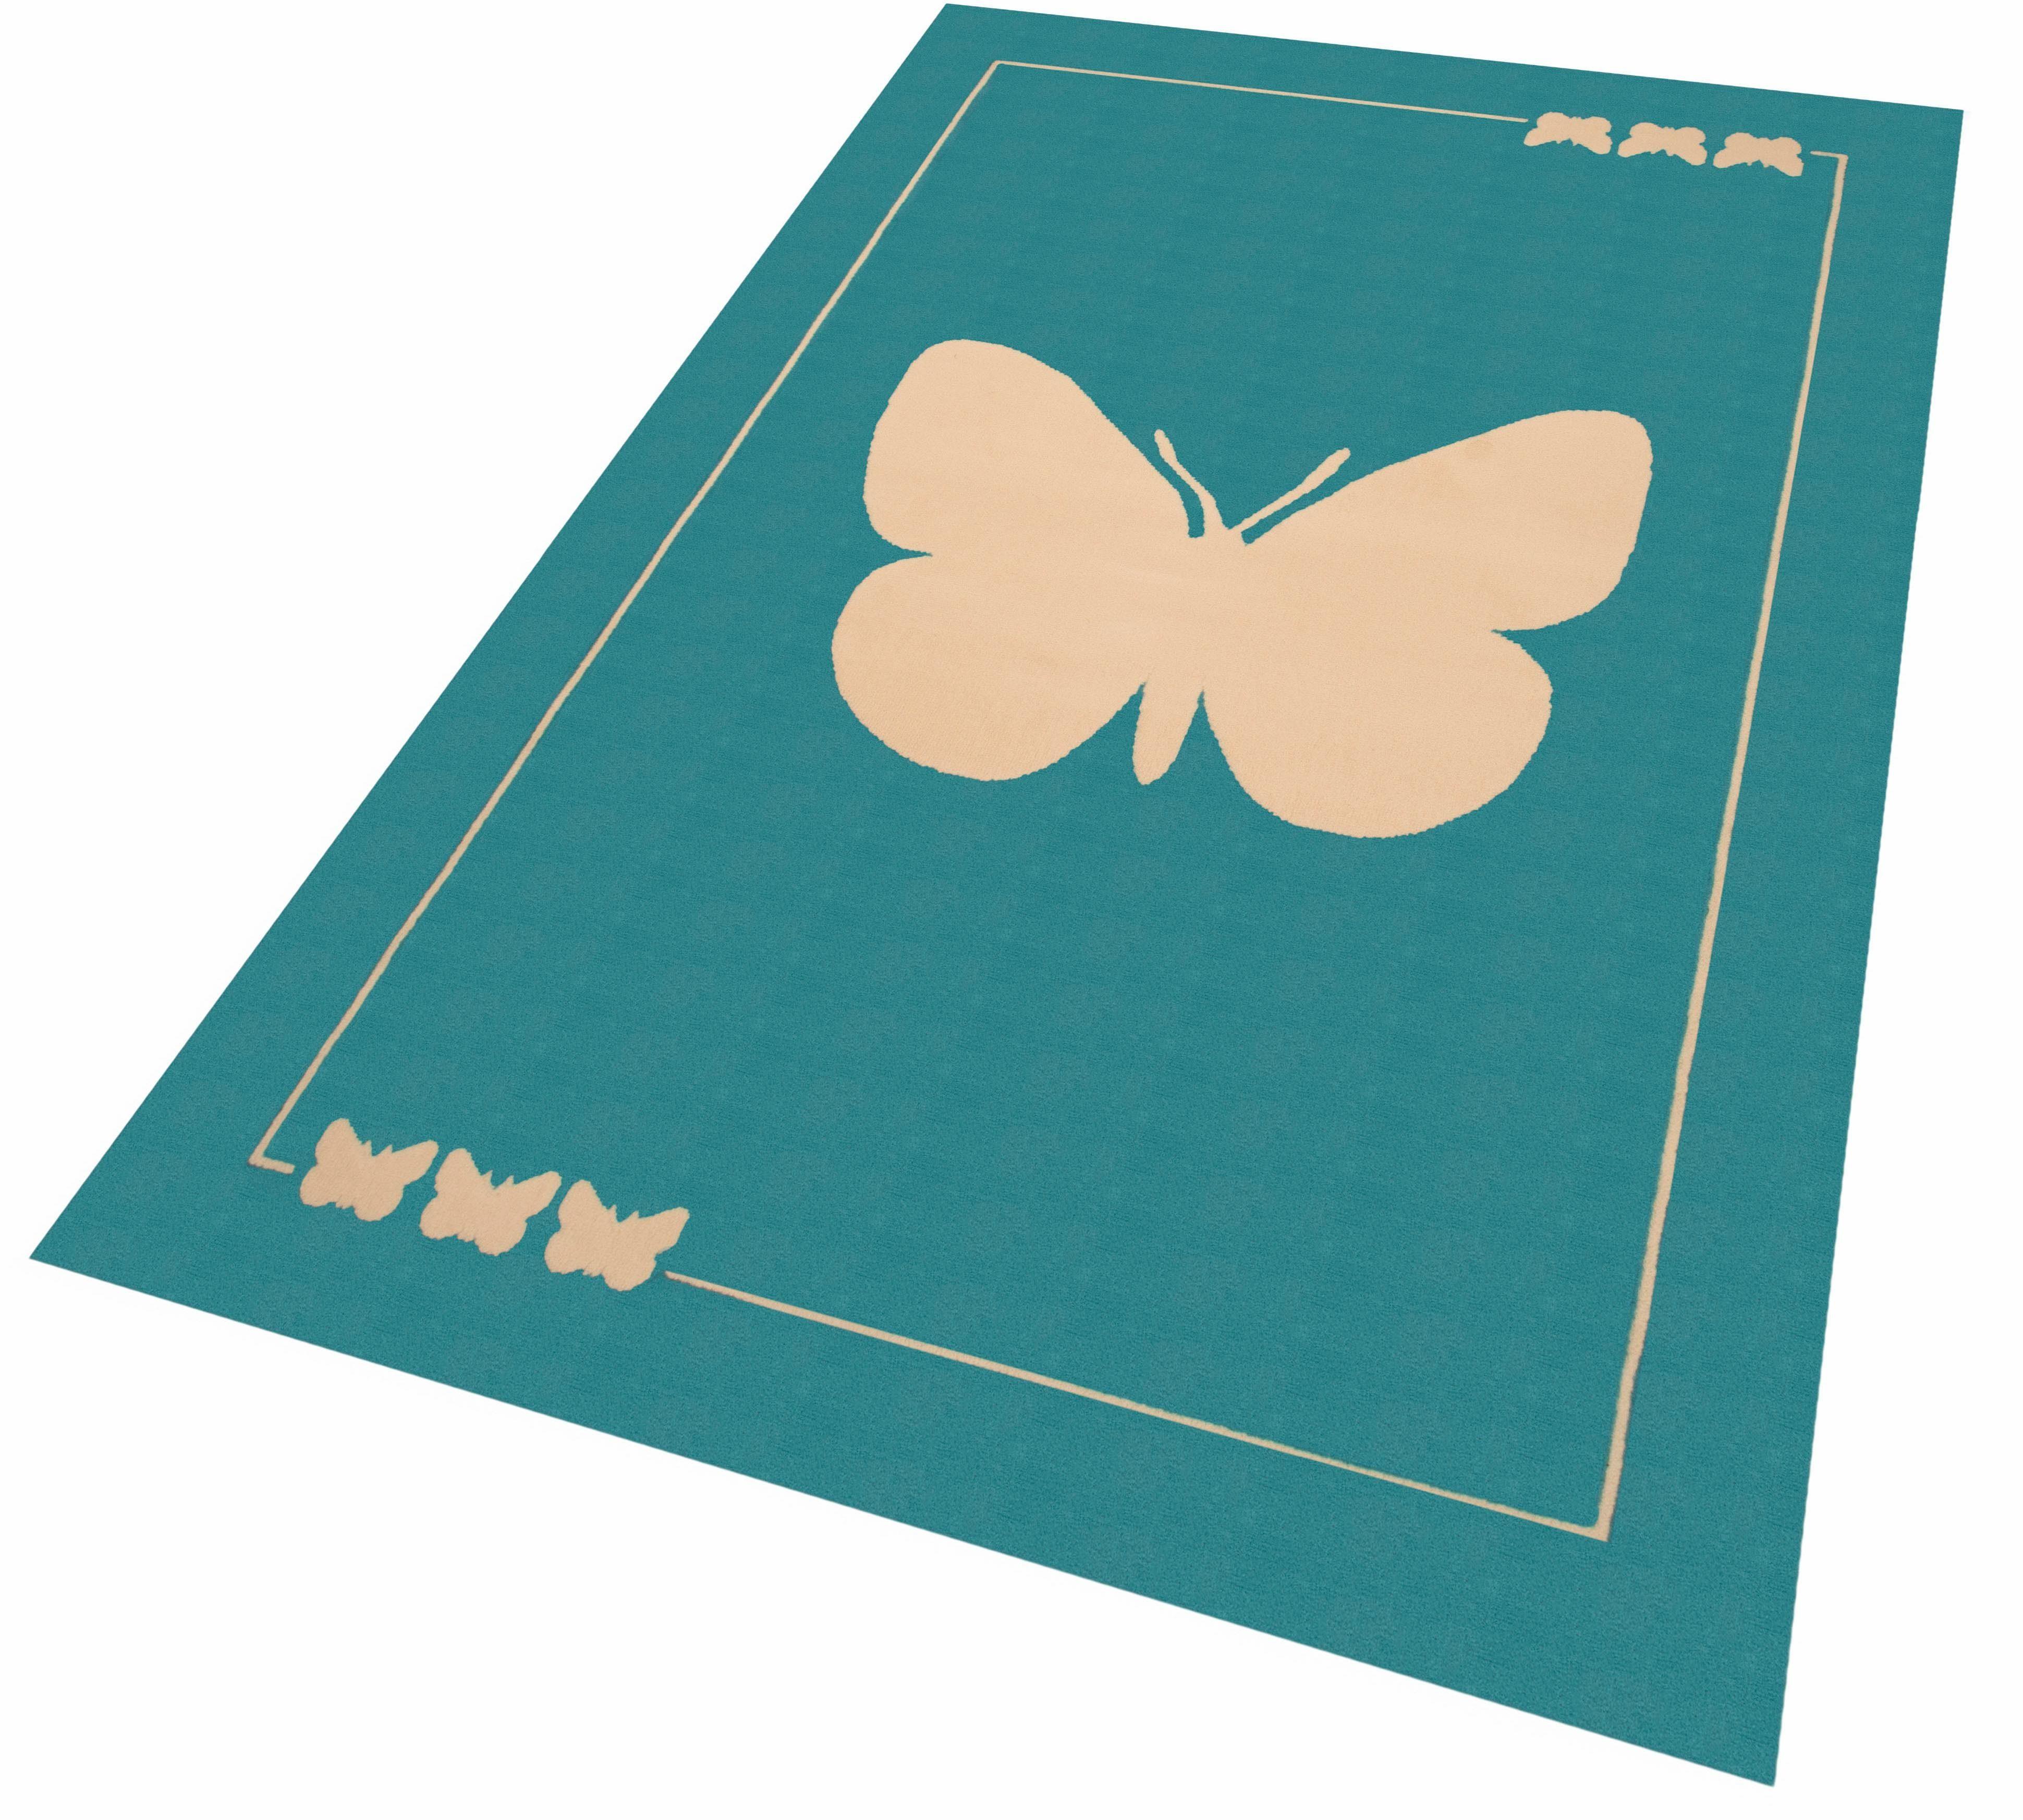 Kinderteppich »Schmetterling«, Zala Living, rechteckig, Höhe 9 mm